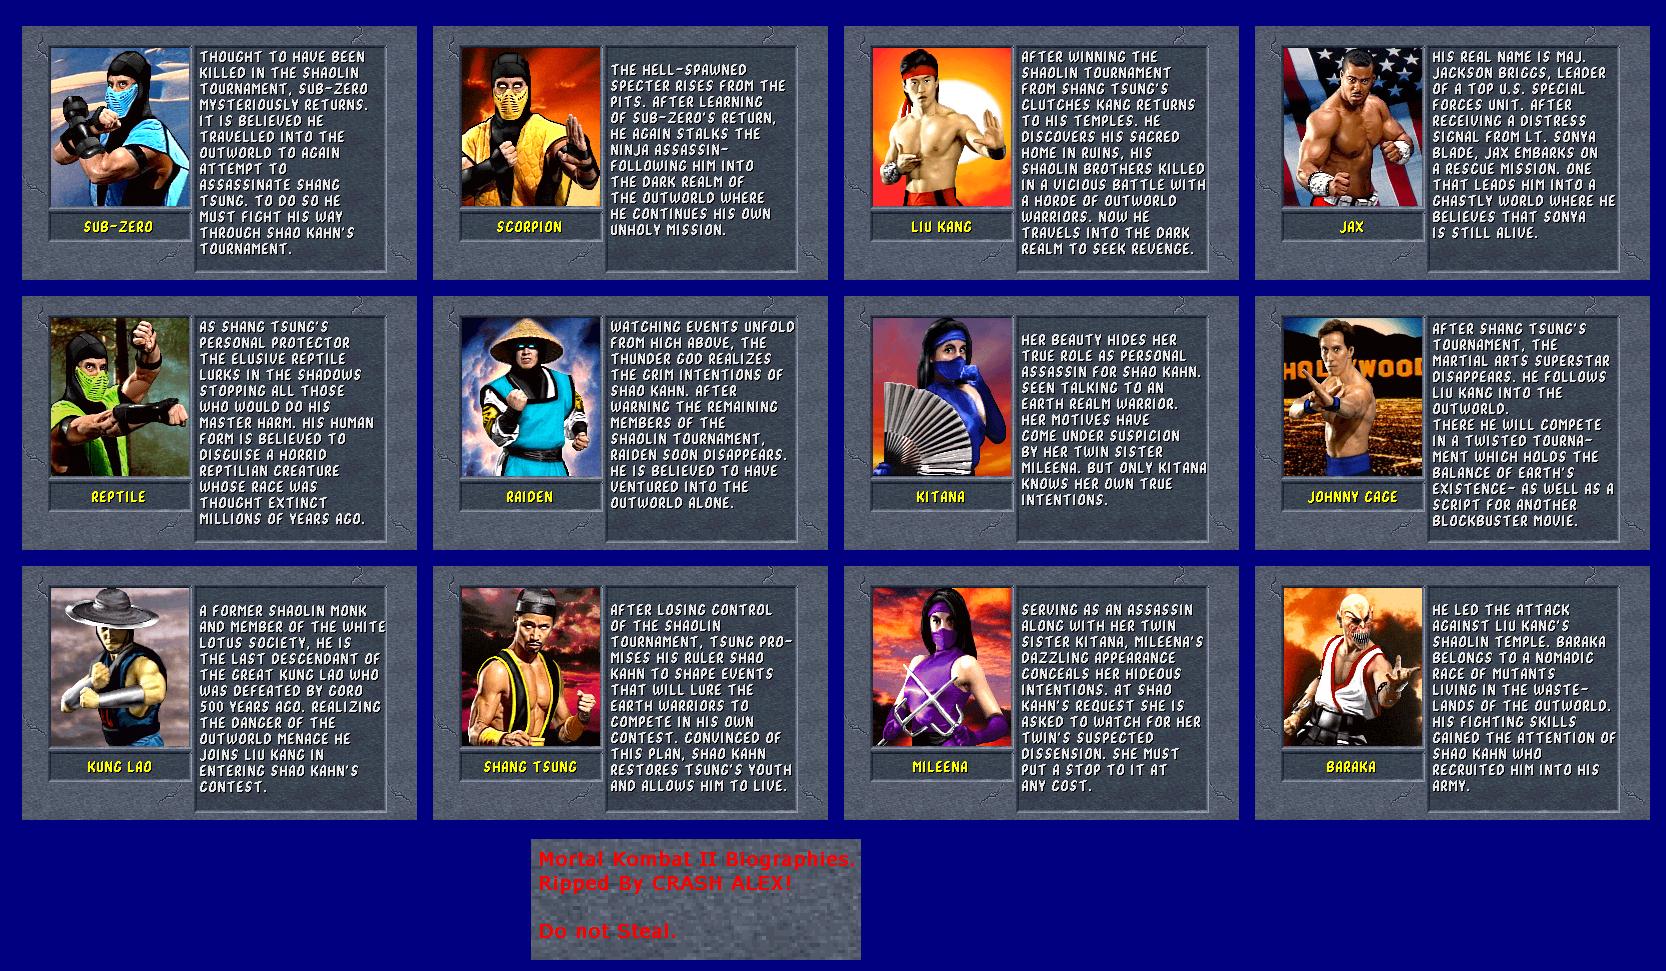 The Spriters Resource - Full Sheet View - Mortal Kombat II